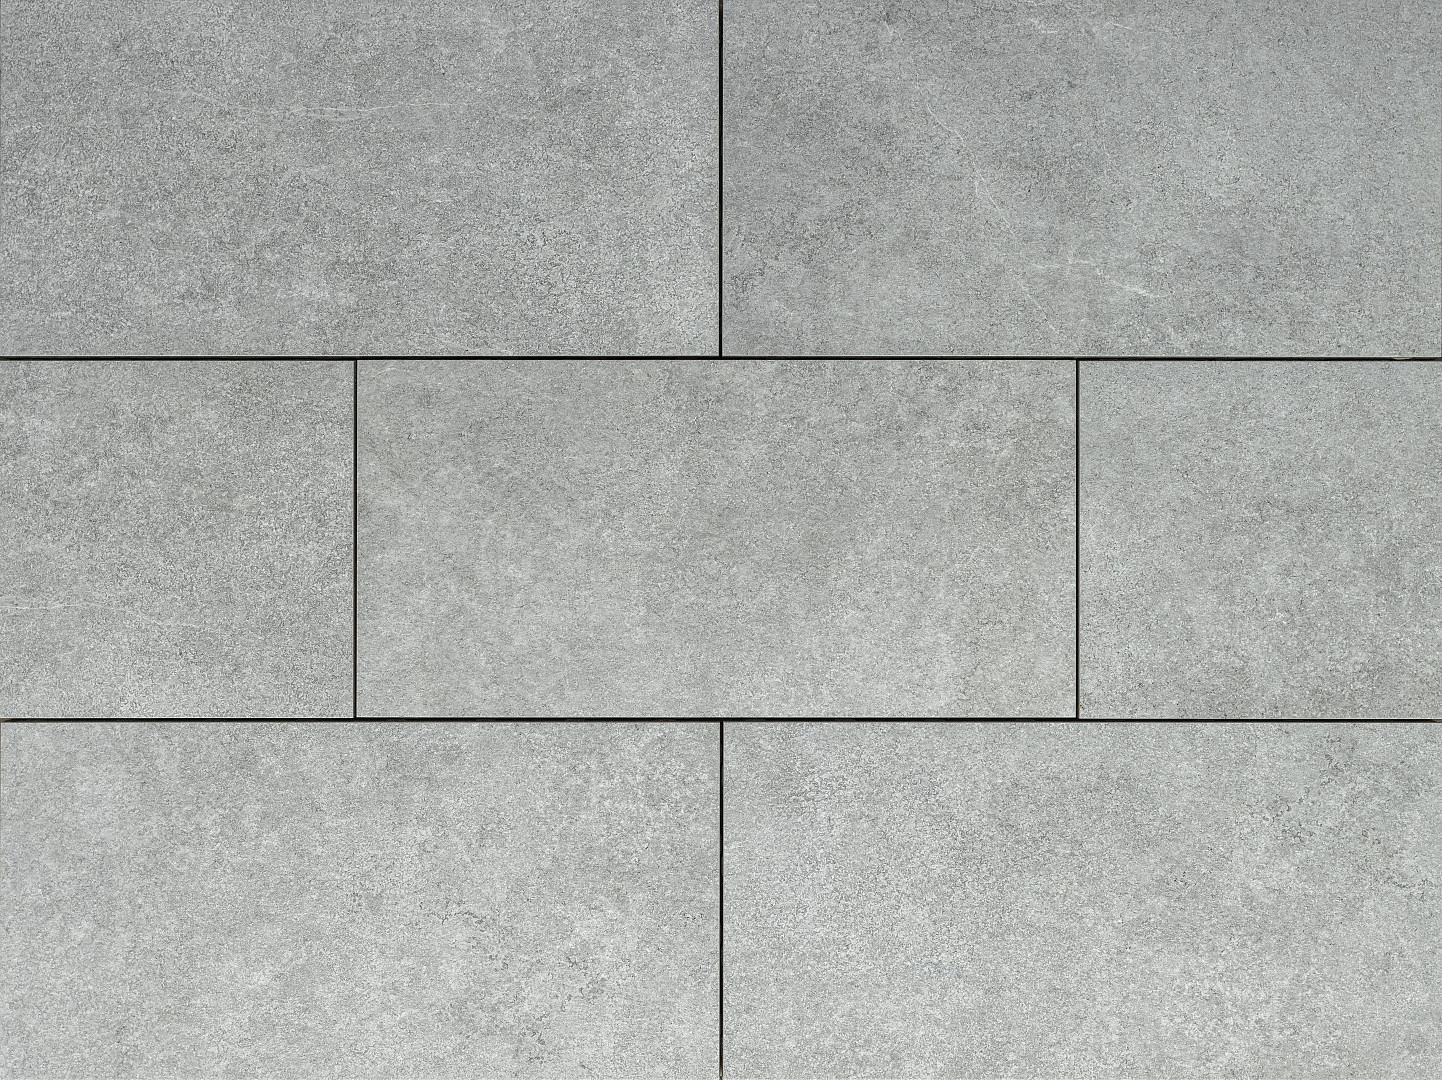 CERASUN Moderno Grigio 40x80x4